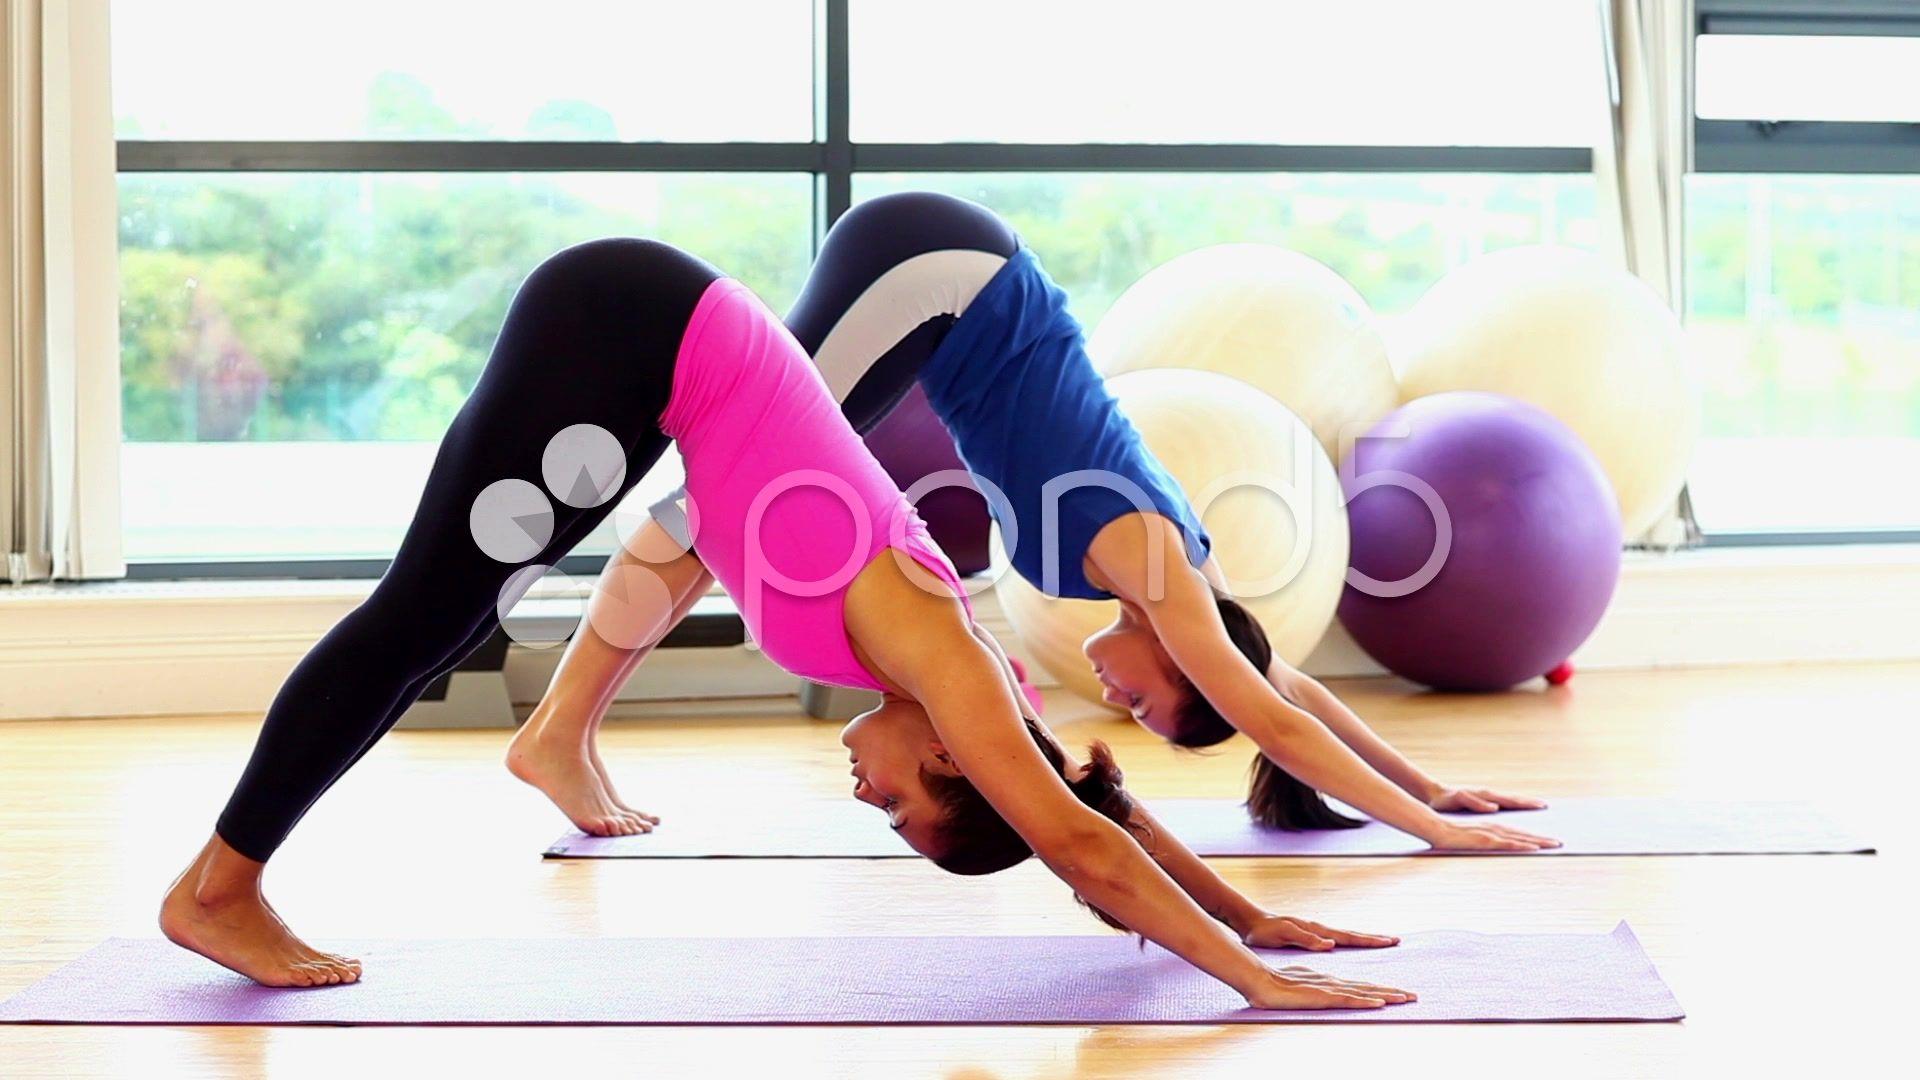 pants yoga Slender shapes